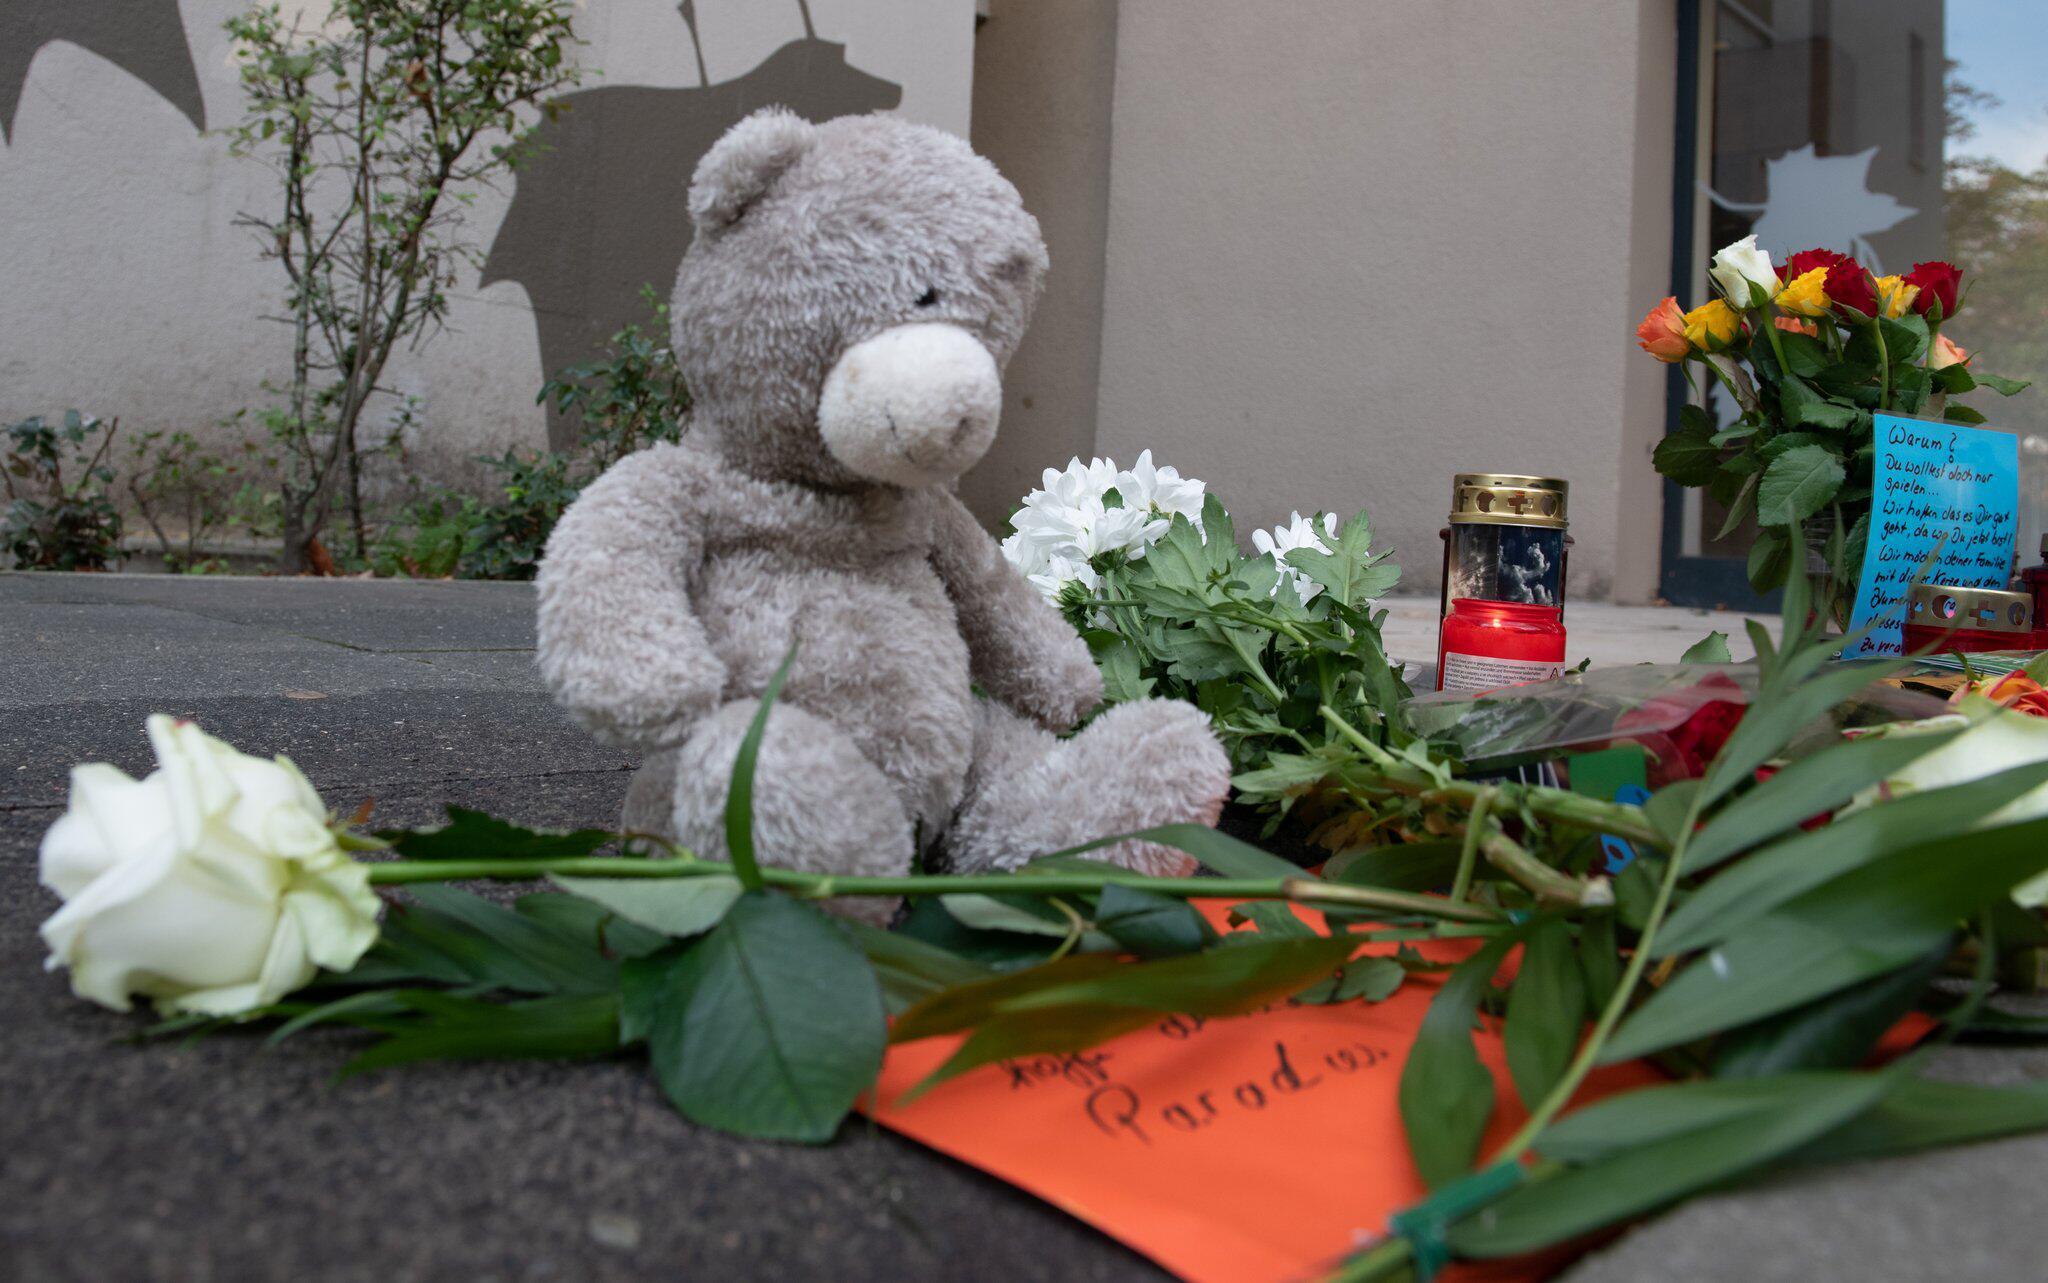 Bild zu Mourning for slain boys